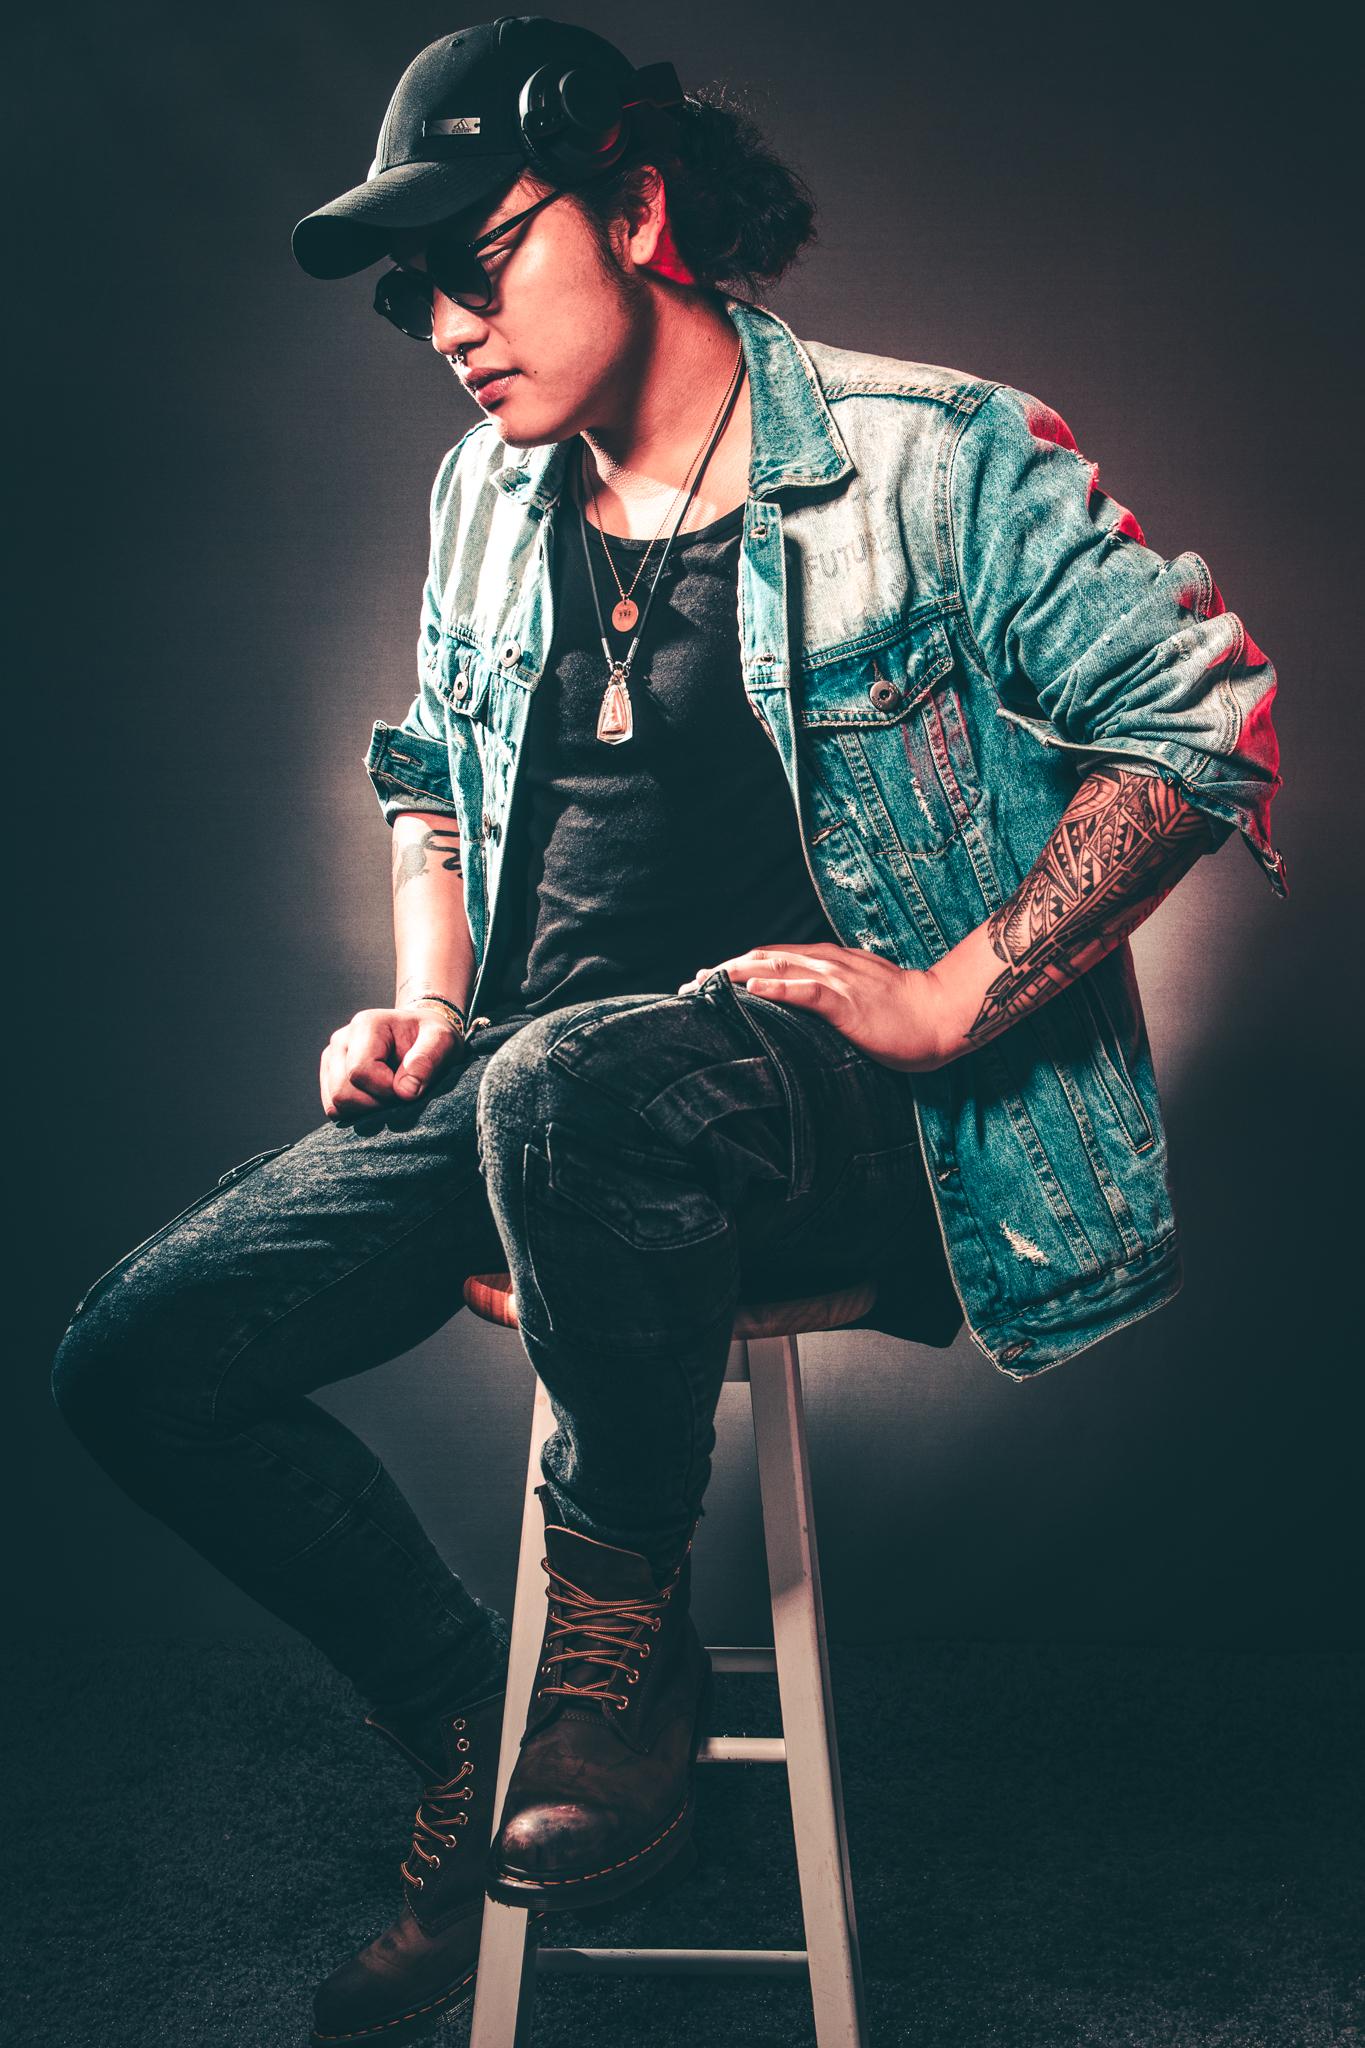 Man Wearing Denim Jacket While Sitting on Chair · Free ... Denim Jacket Photography